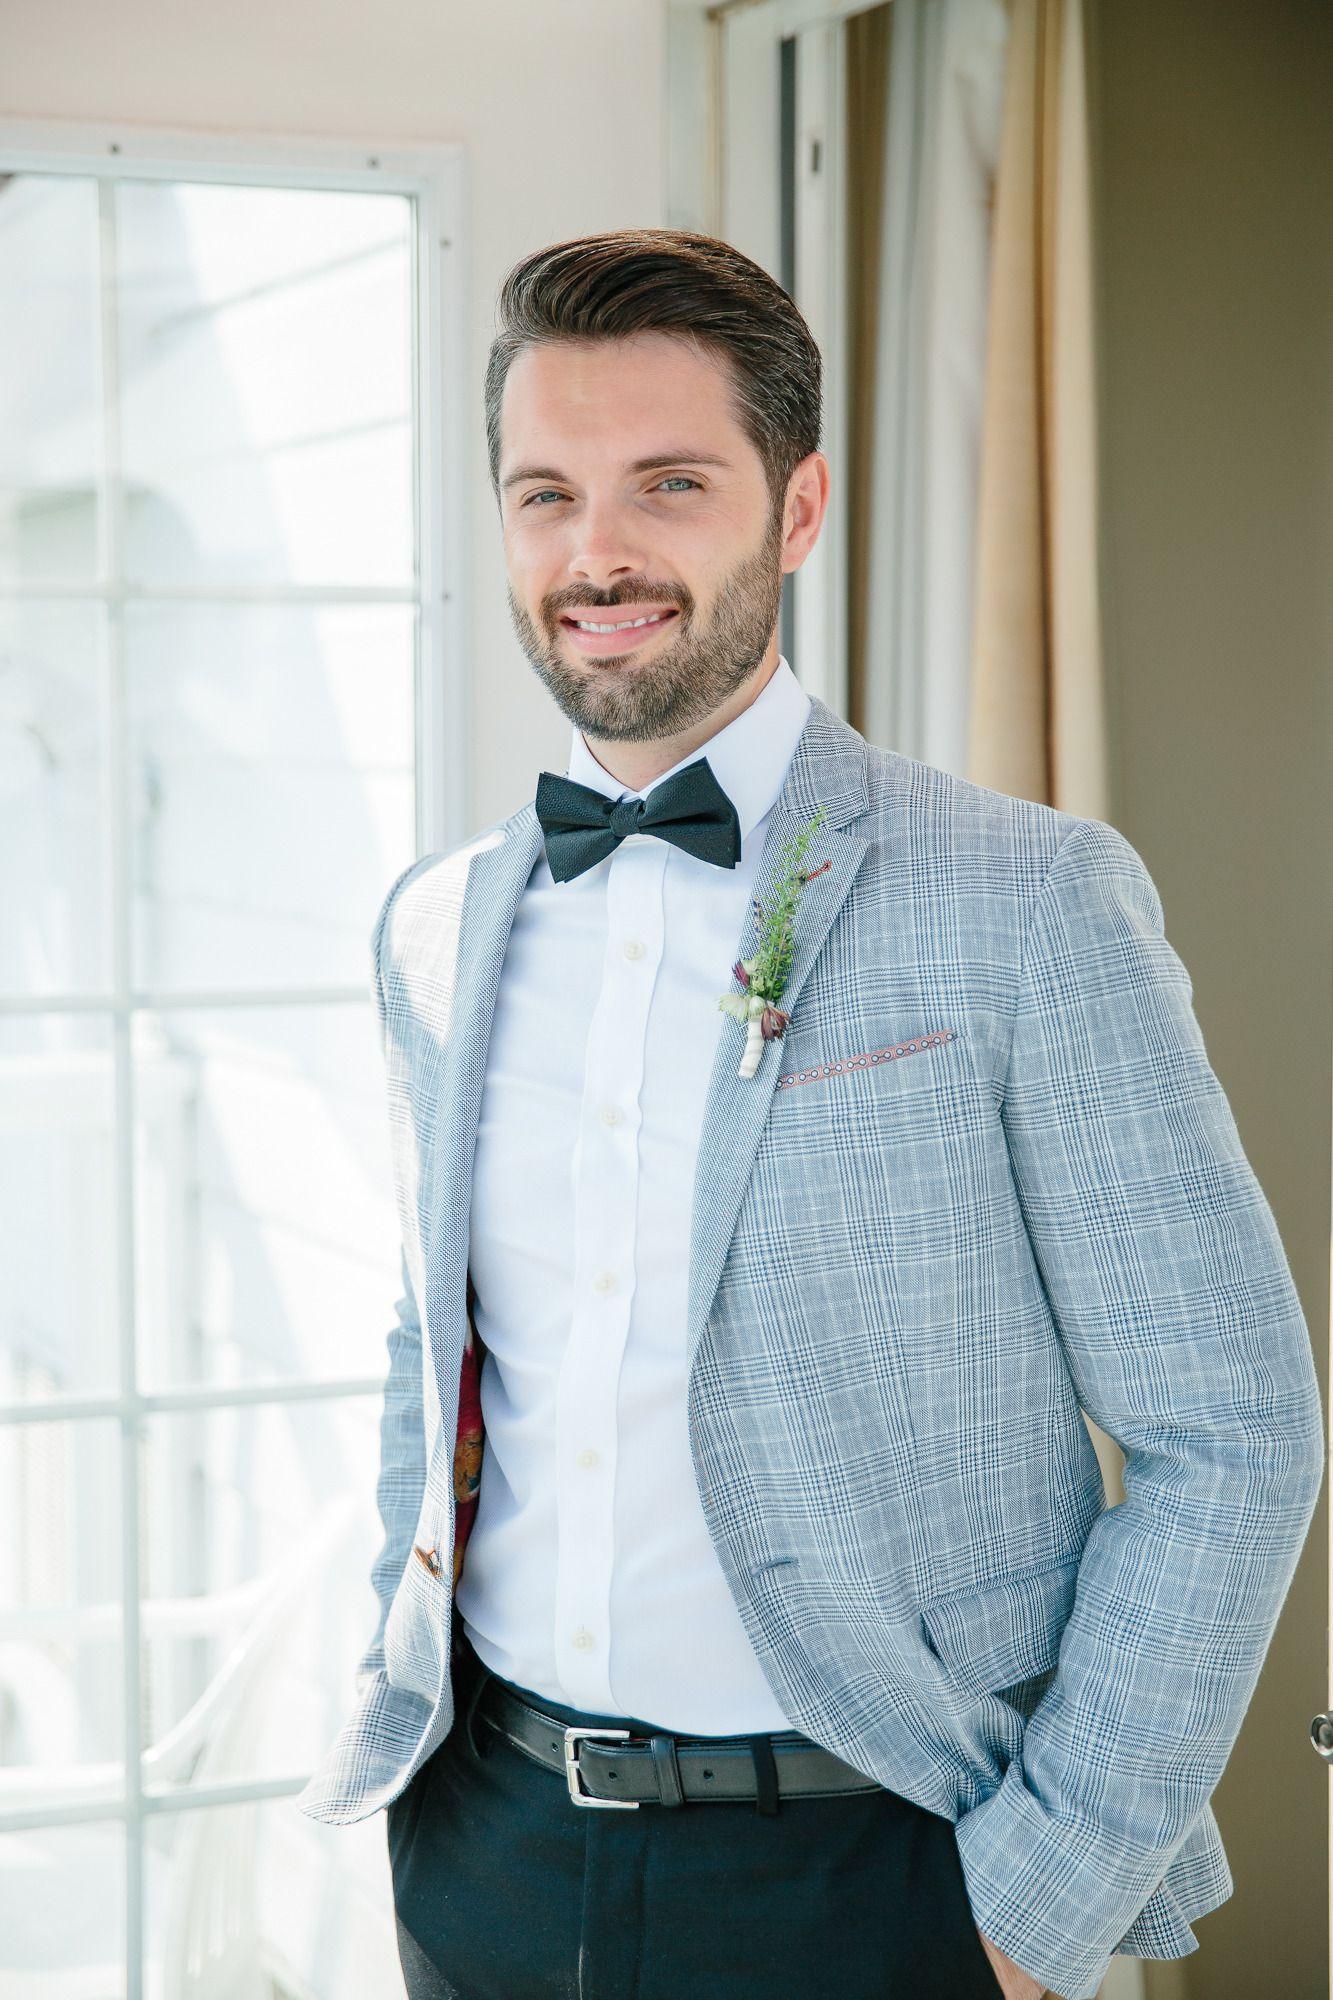 Summer Wedding at Windermere House | Groom style, Wedding and Weddings